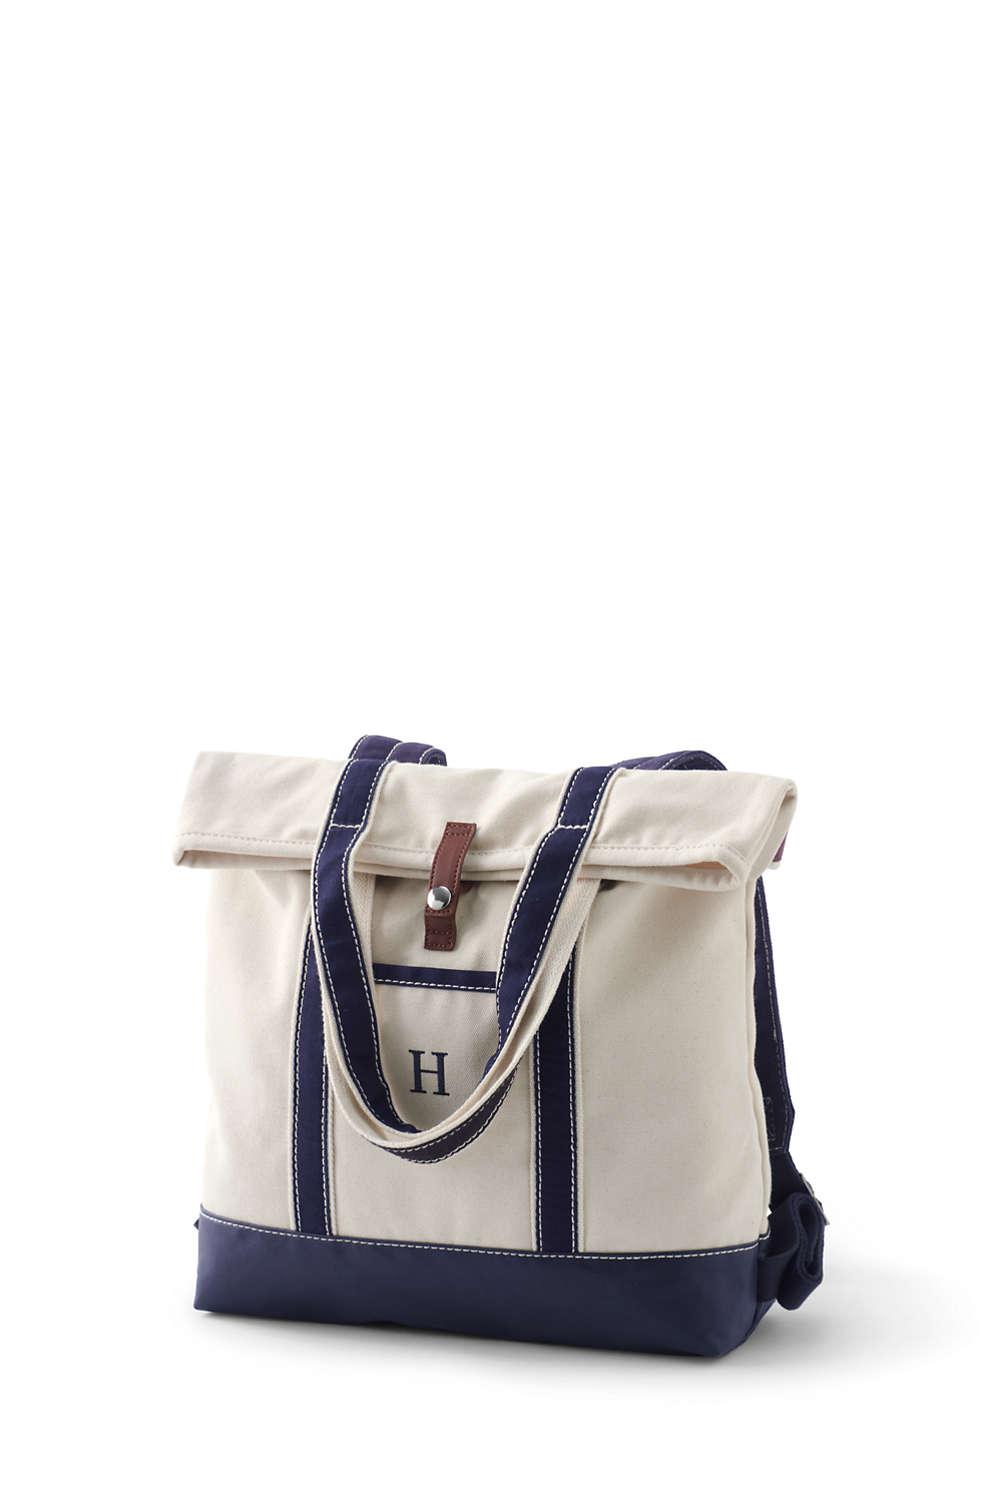 abf249d48e Lightweight Convertible Tote Backpack. Item  5008076UX. View Fullscreen